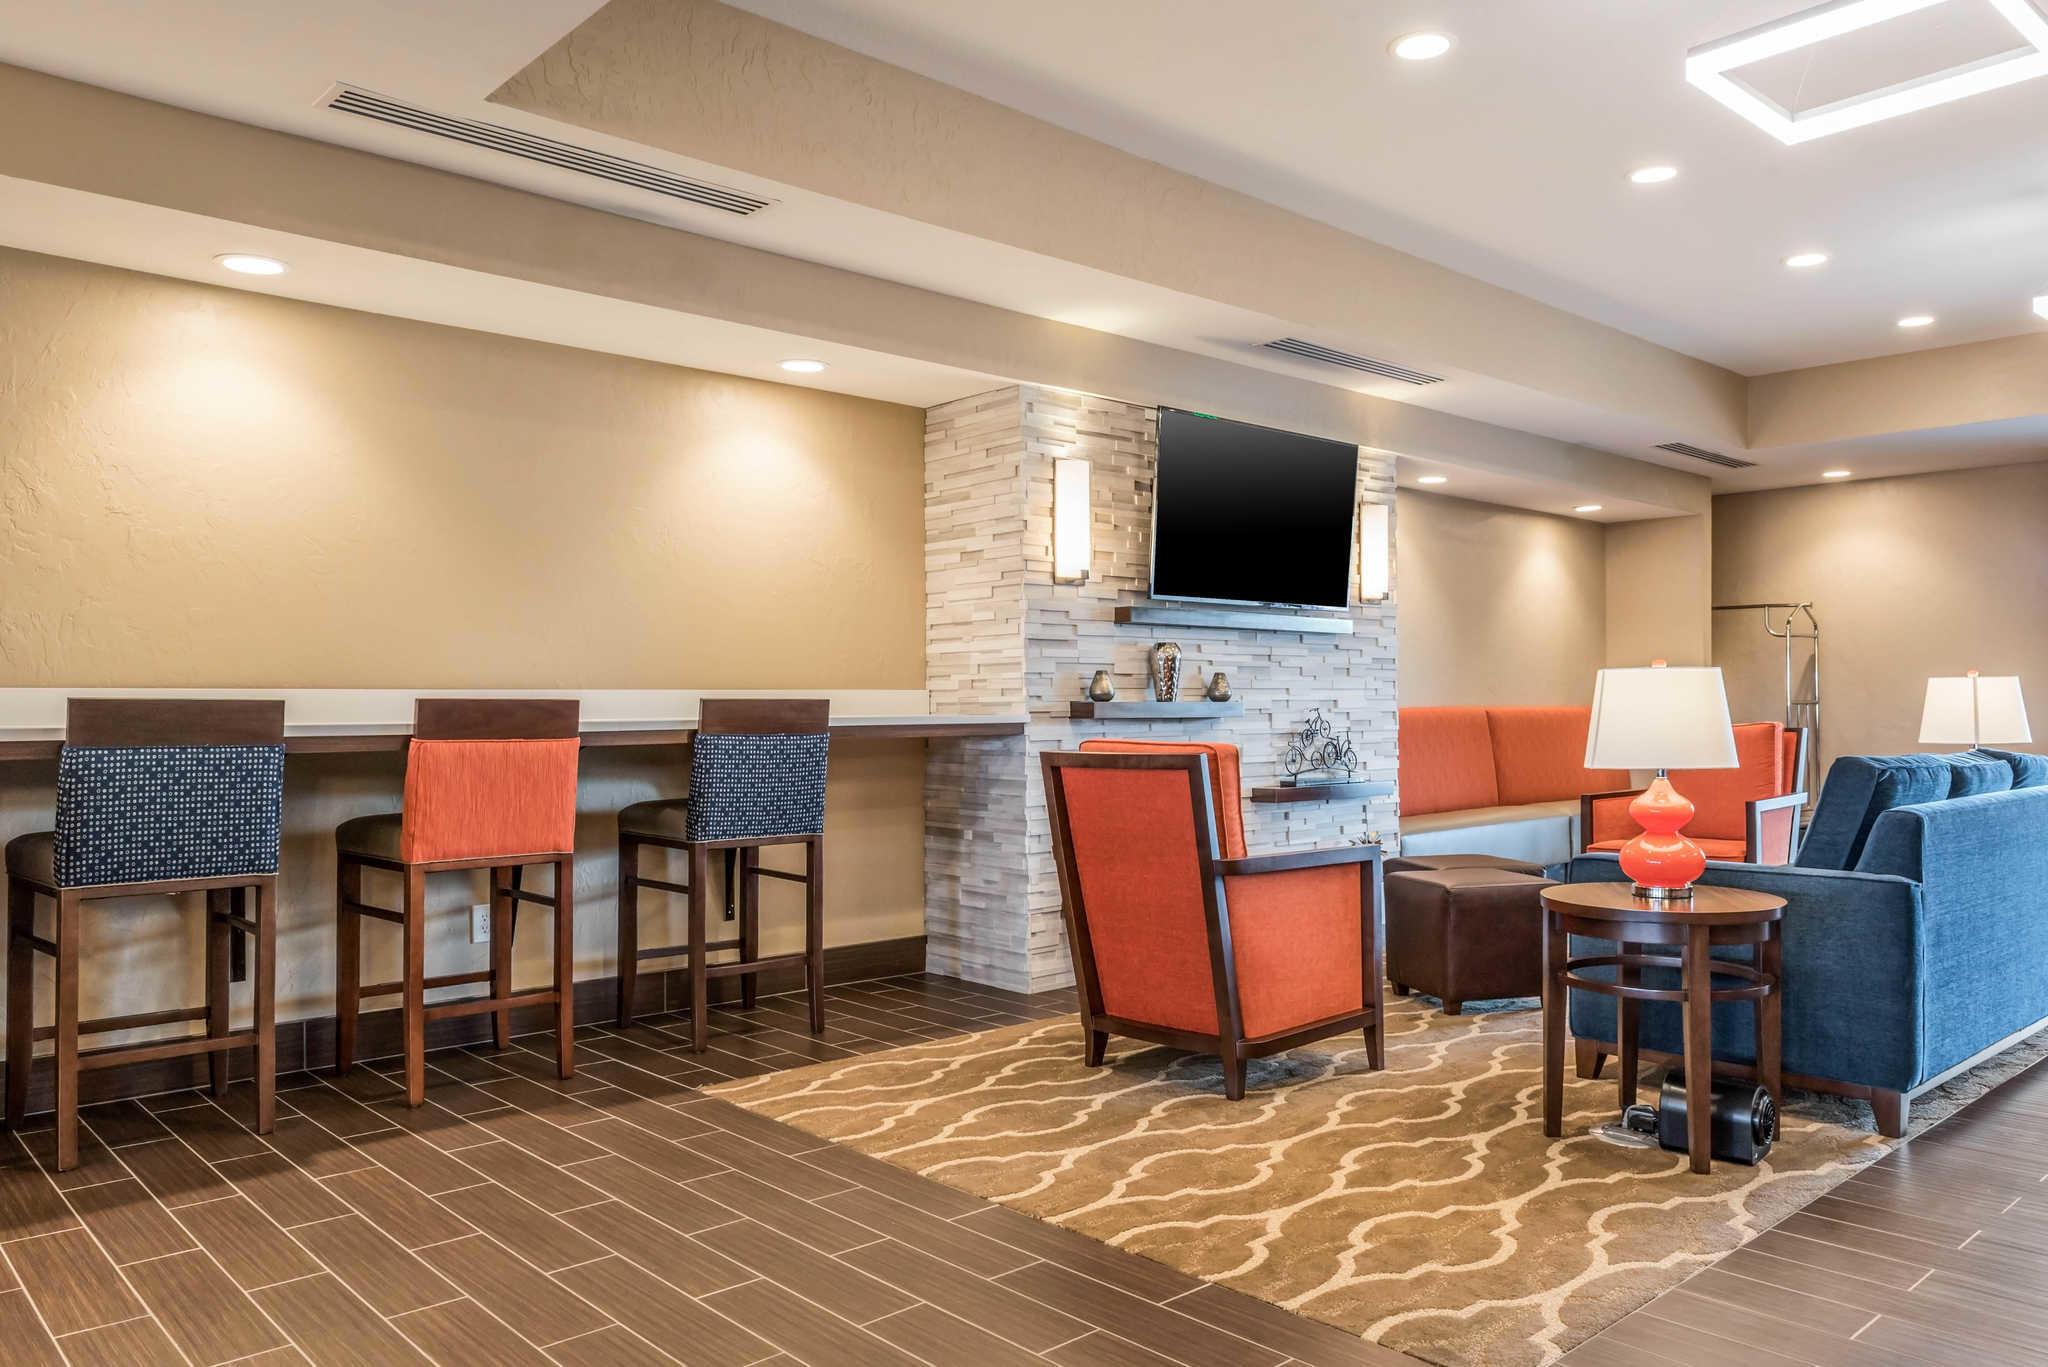 Hotel Rooms In The Newport Kentucky Area